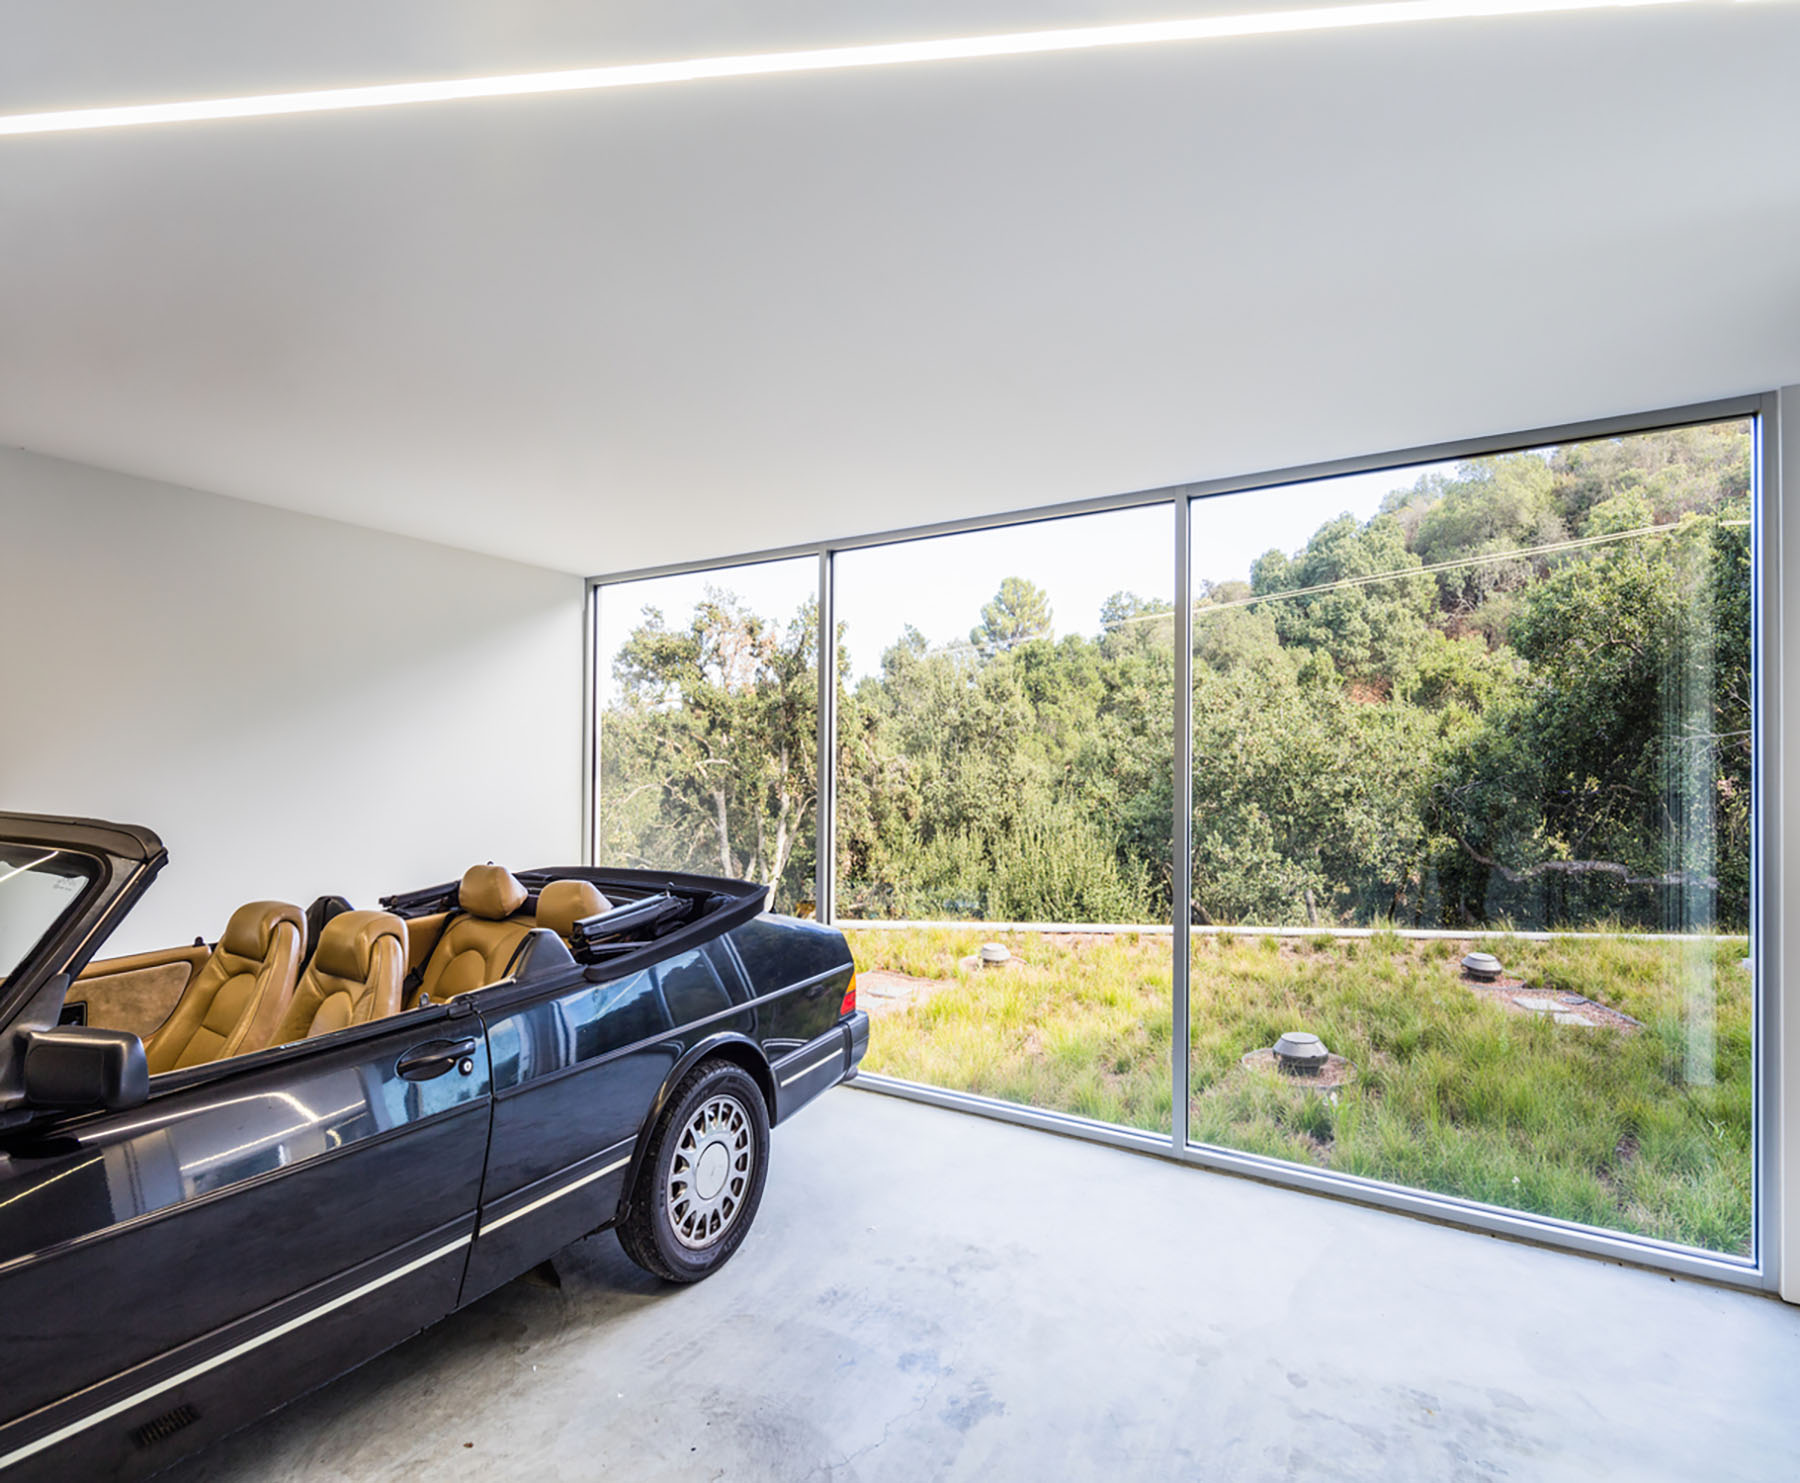 iGNANT-Architecture-Craig-Steely-Pam-Pauls-House-013b